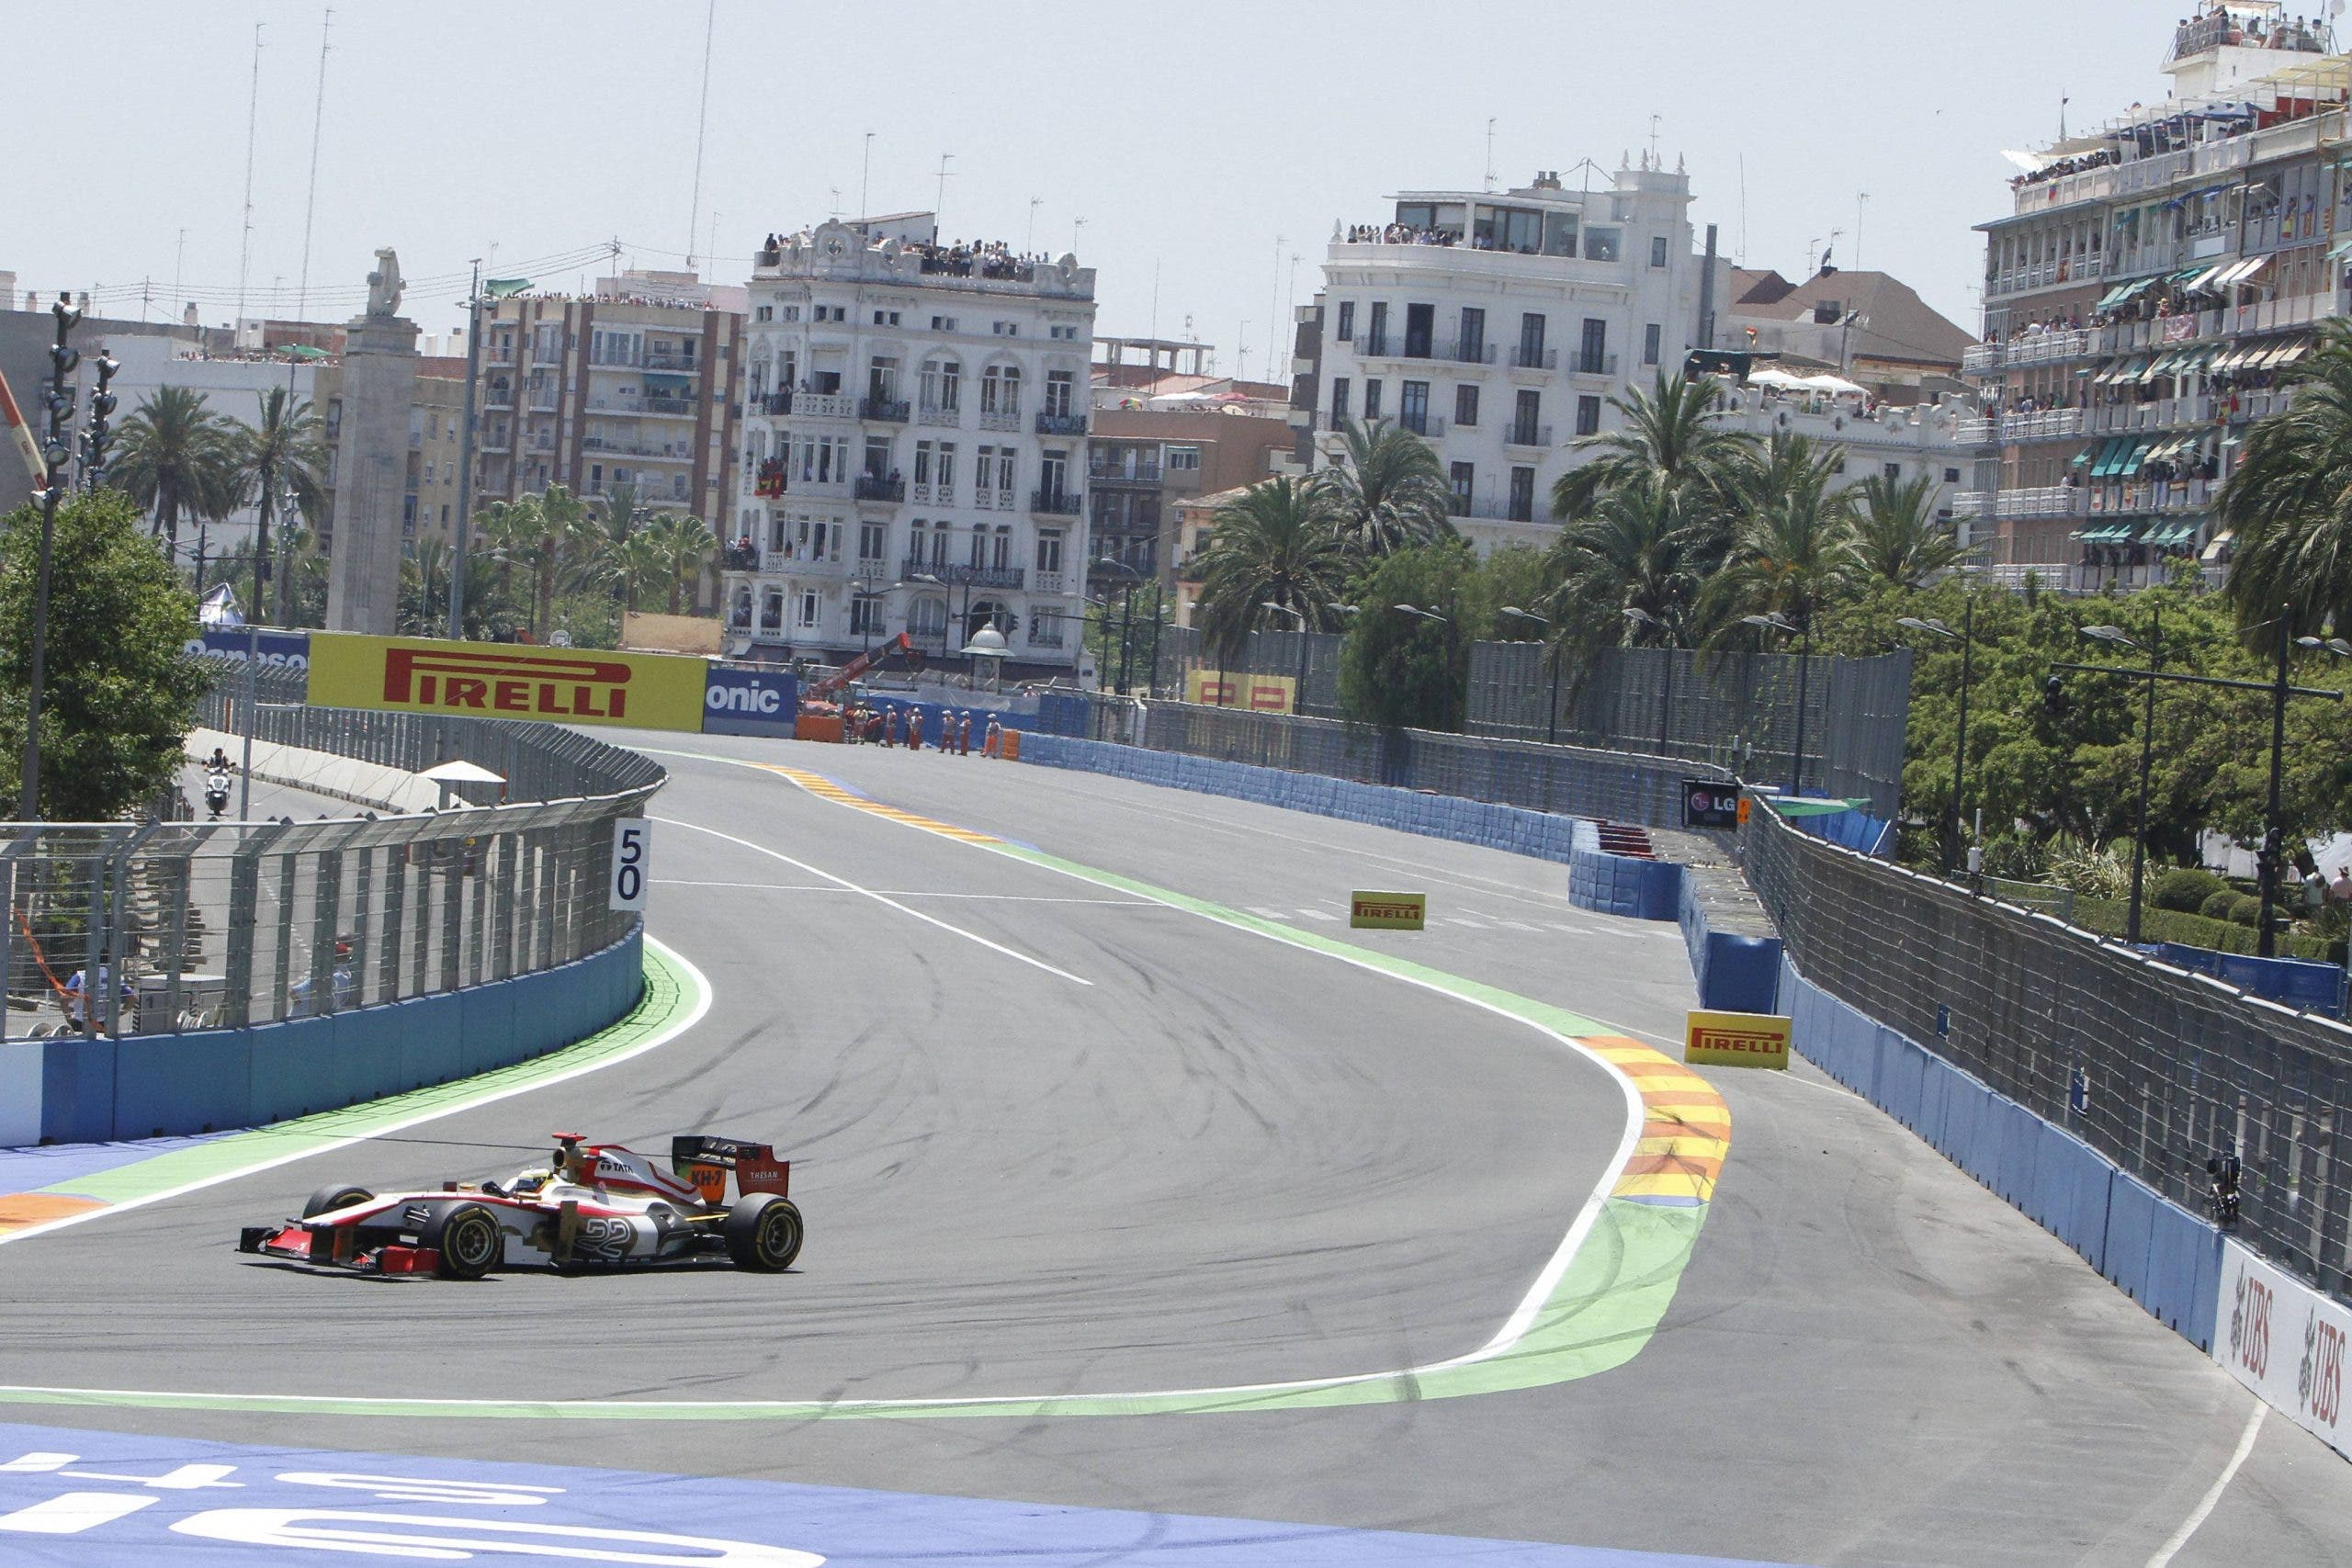 European Grand Prix Formula 1 Urban Street Circuit, Valencia